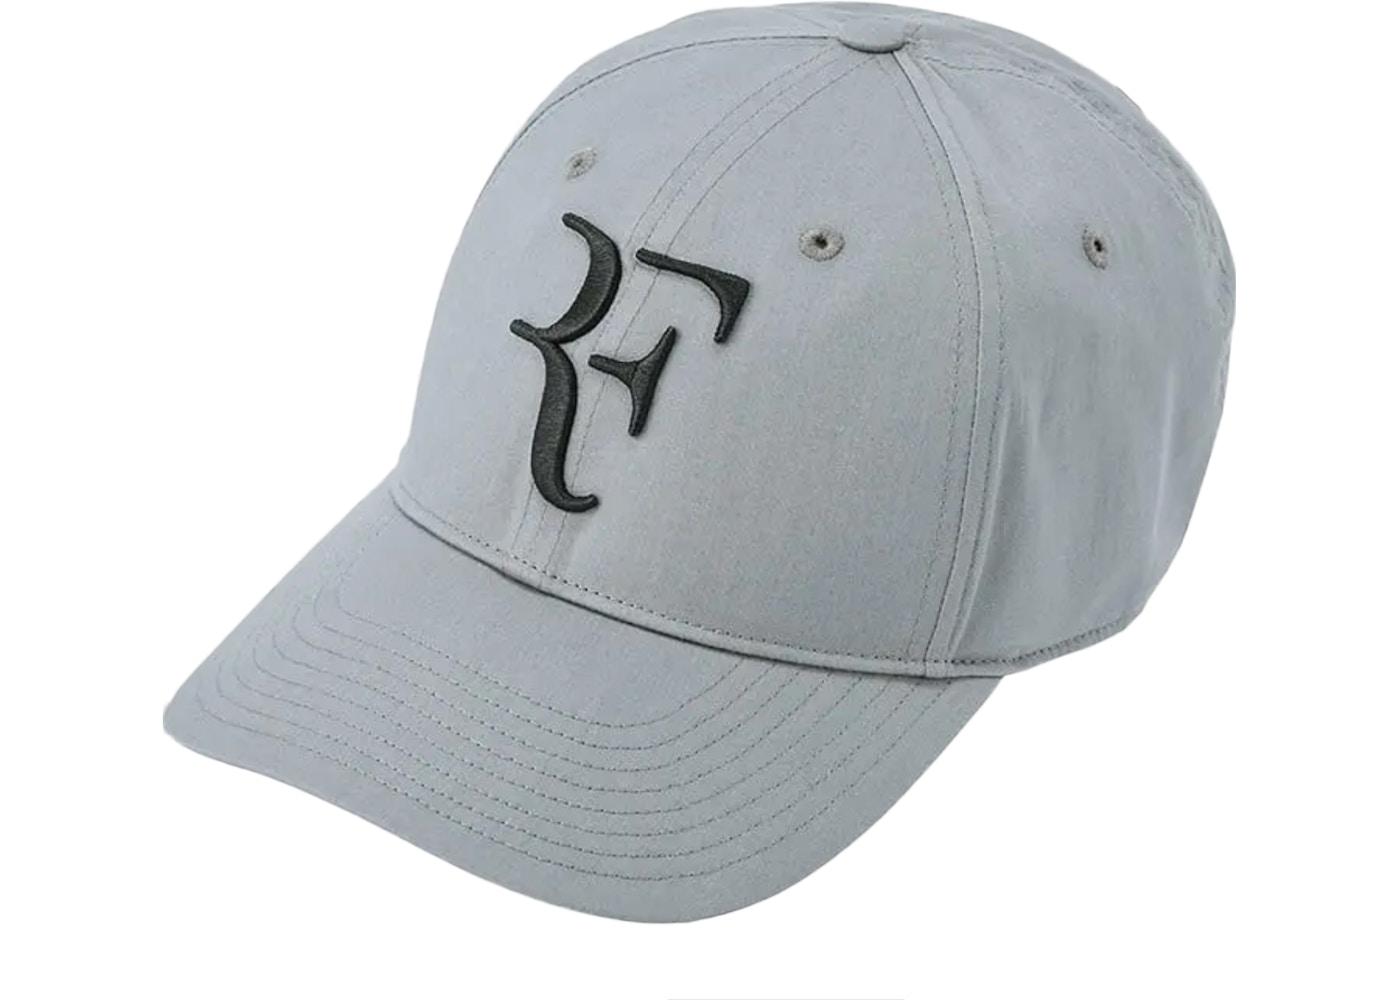 Uniqlo Roger Federer Hat Grey - FW20